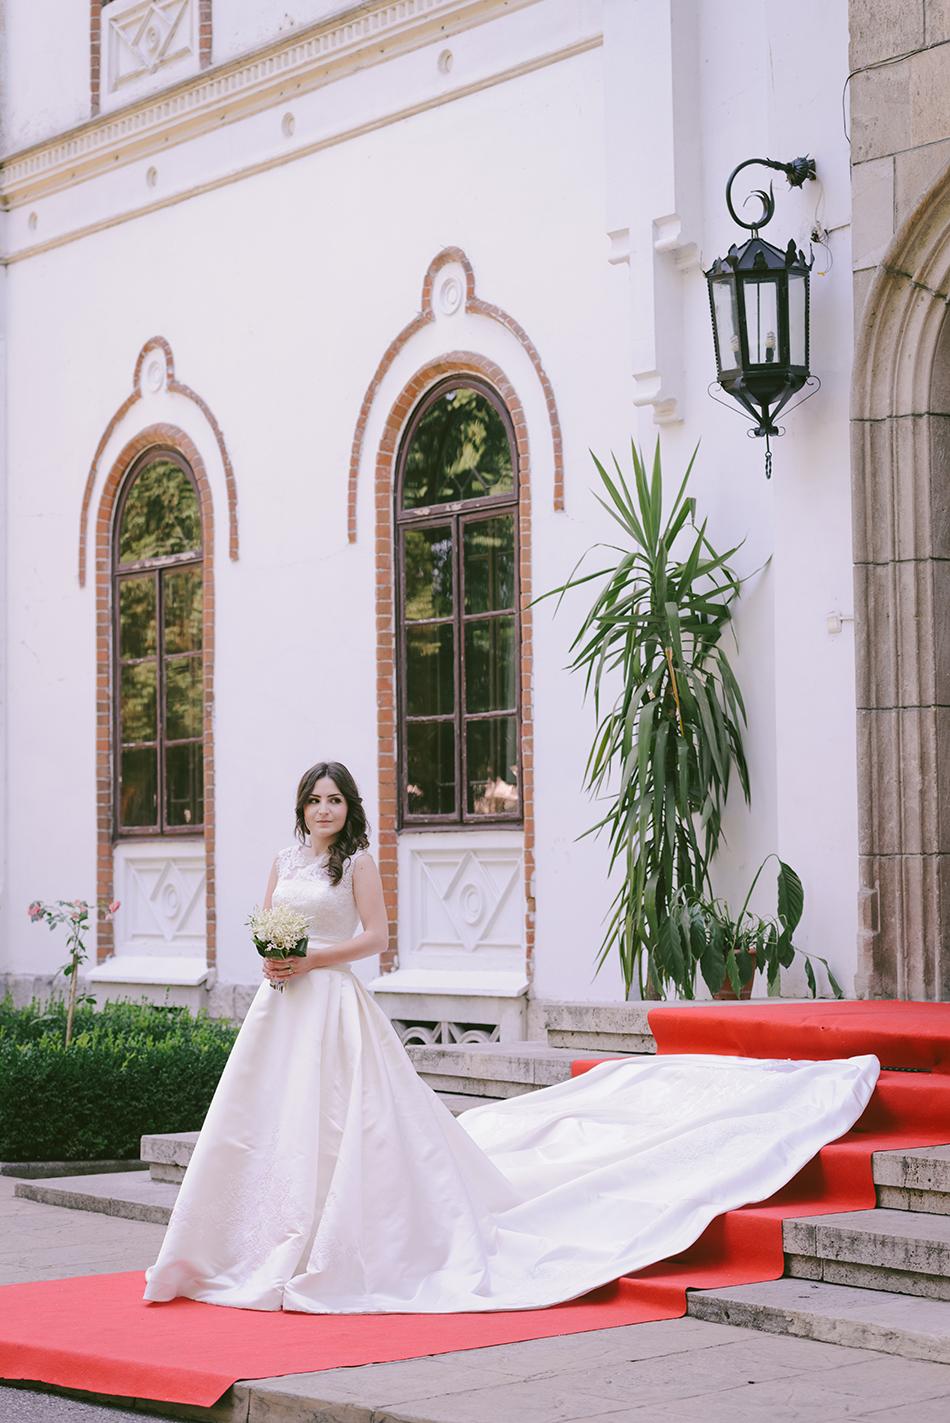 AD Passion Photography | astrid-madalin-nunta-rin-grand-hotel-bucuresti-fotograf-profesionist_0071 | Adelin, Dida, fotograf profesionist, fotograf de nunta, fotografie de nunta, fotograf Timisoara, fotograf Craiova, fotograf Bucuresti, fotograf Arad, nunta Timisoara, nunta Arad, nunta Bucuresti, nunta Craiova